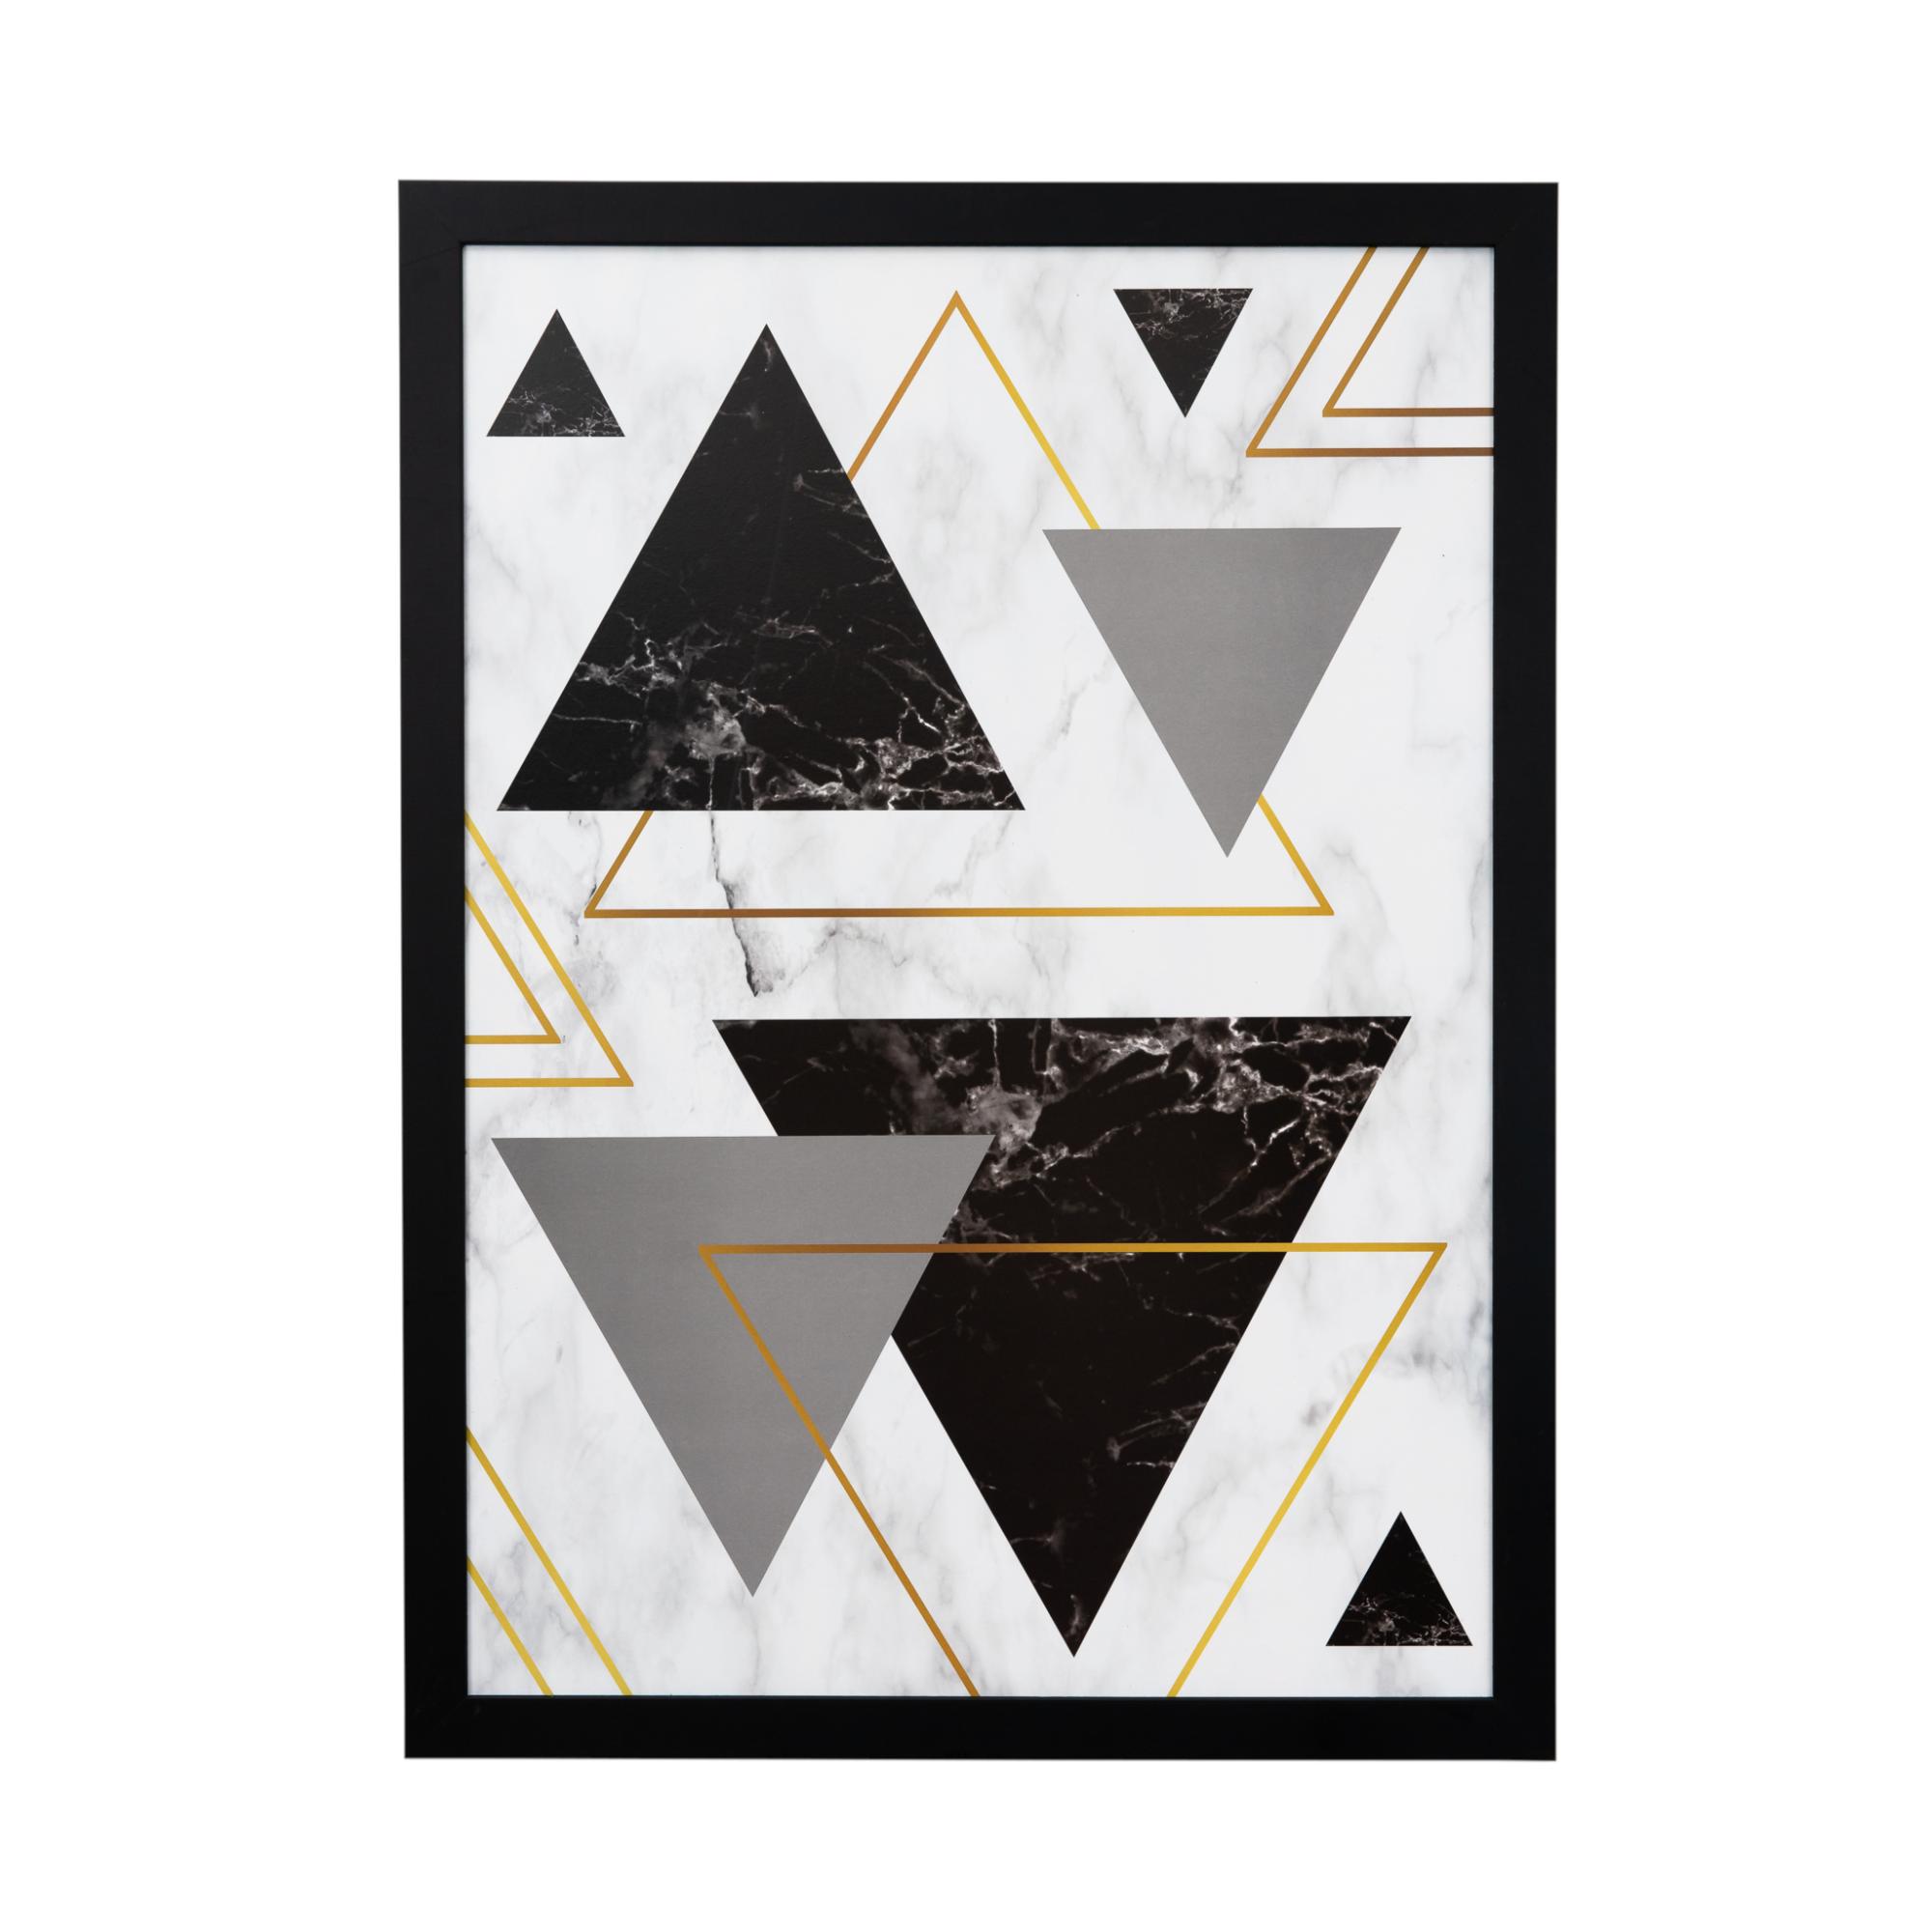 Quadro Decorativo 50x70cm Triangulos Preto - Art Frame